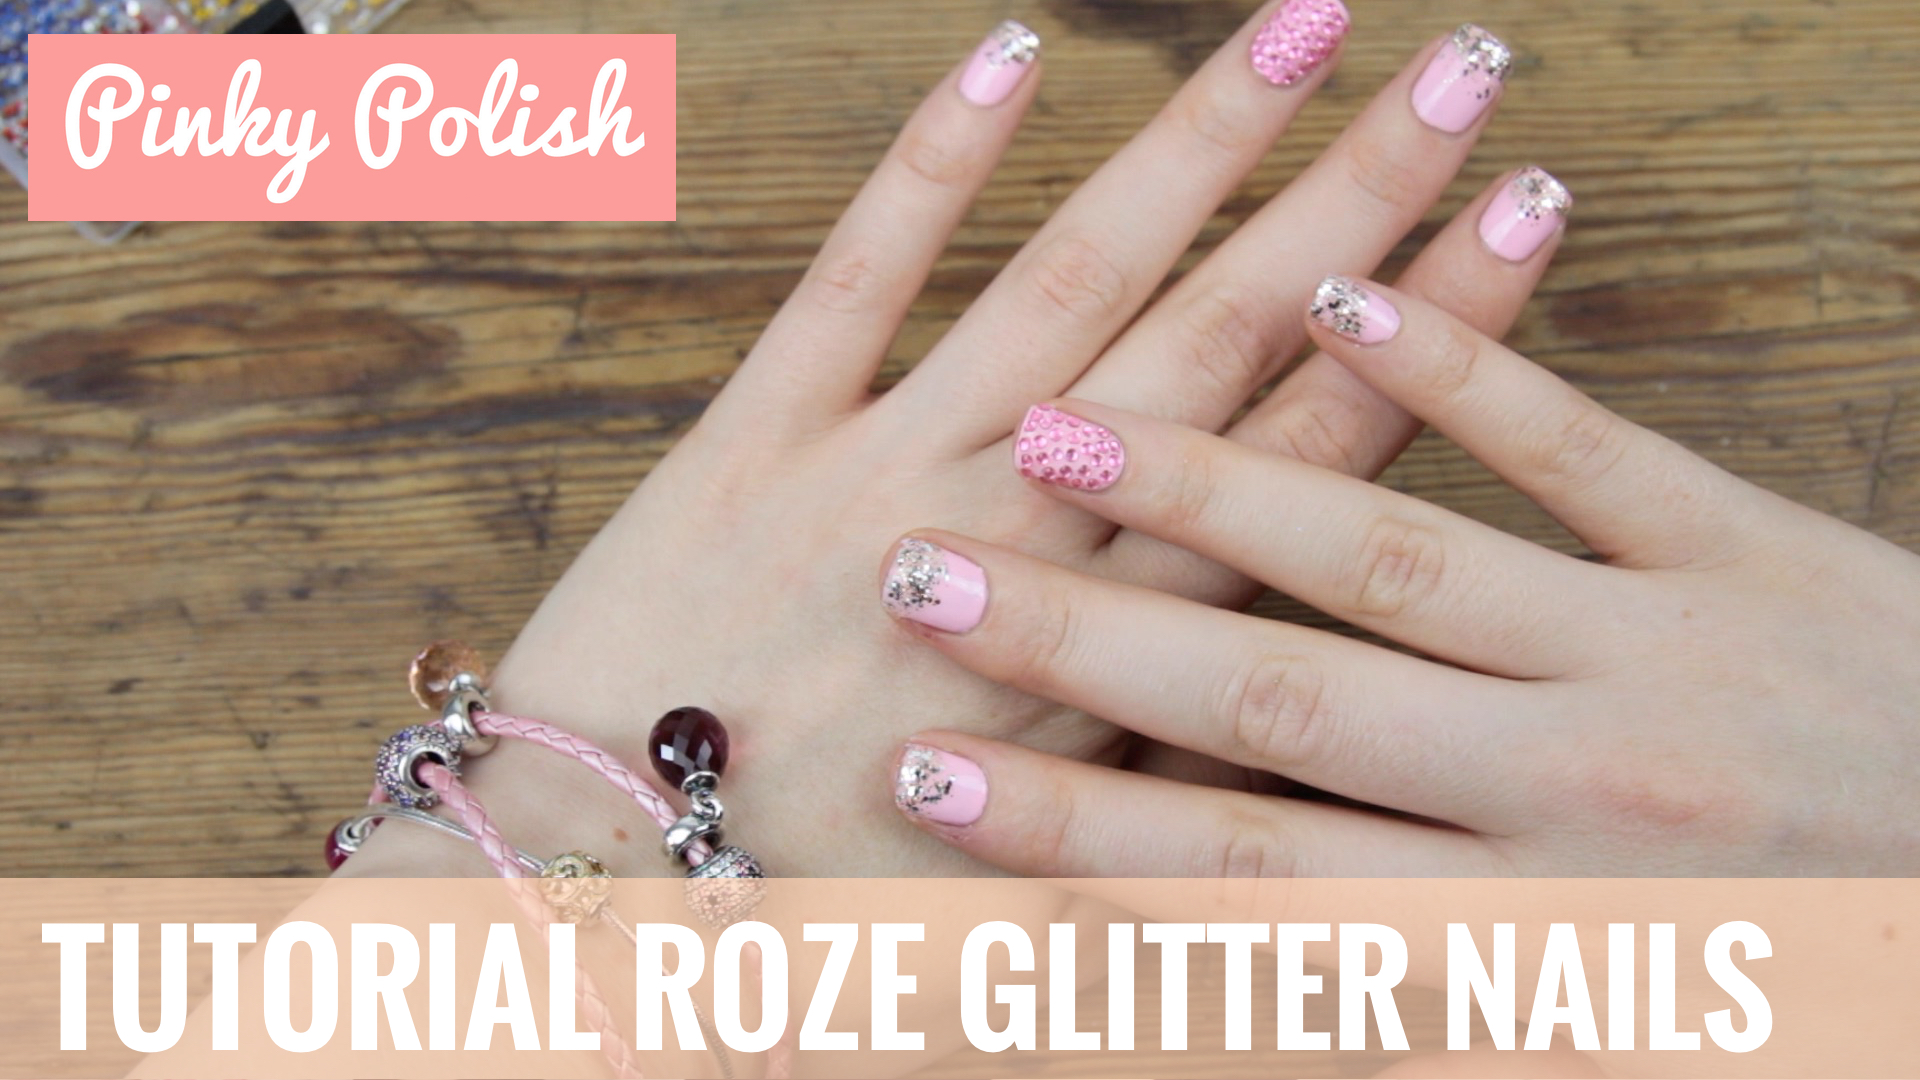 Video Tutorial Roze Glitter Nails Met Pandora Pinky Polish